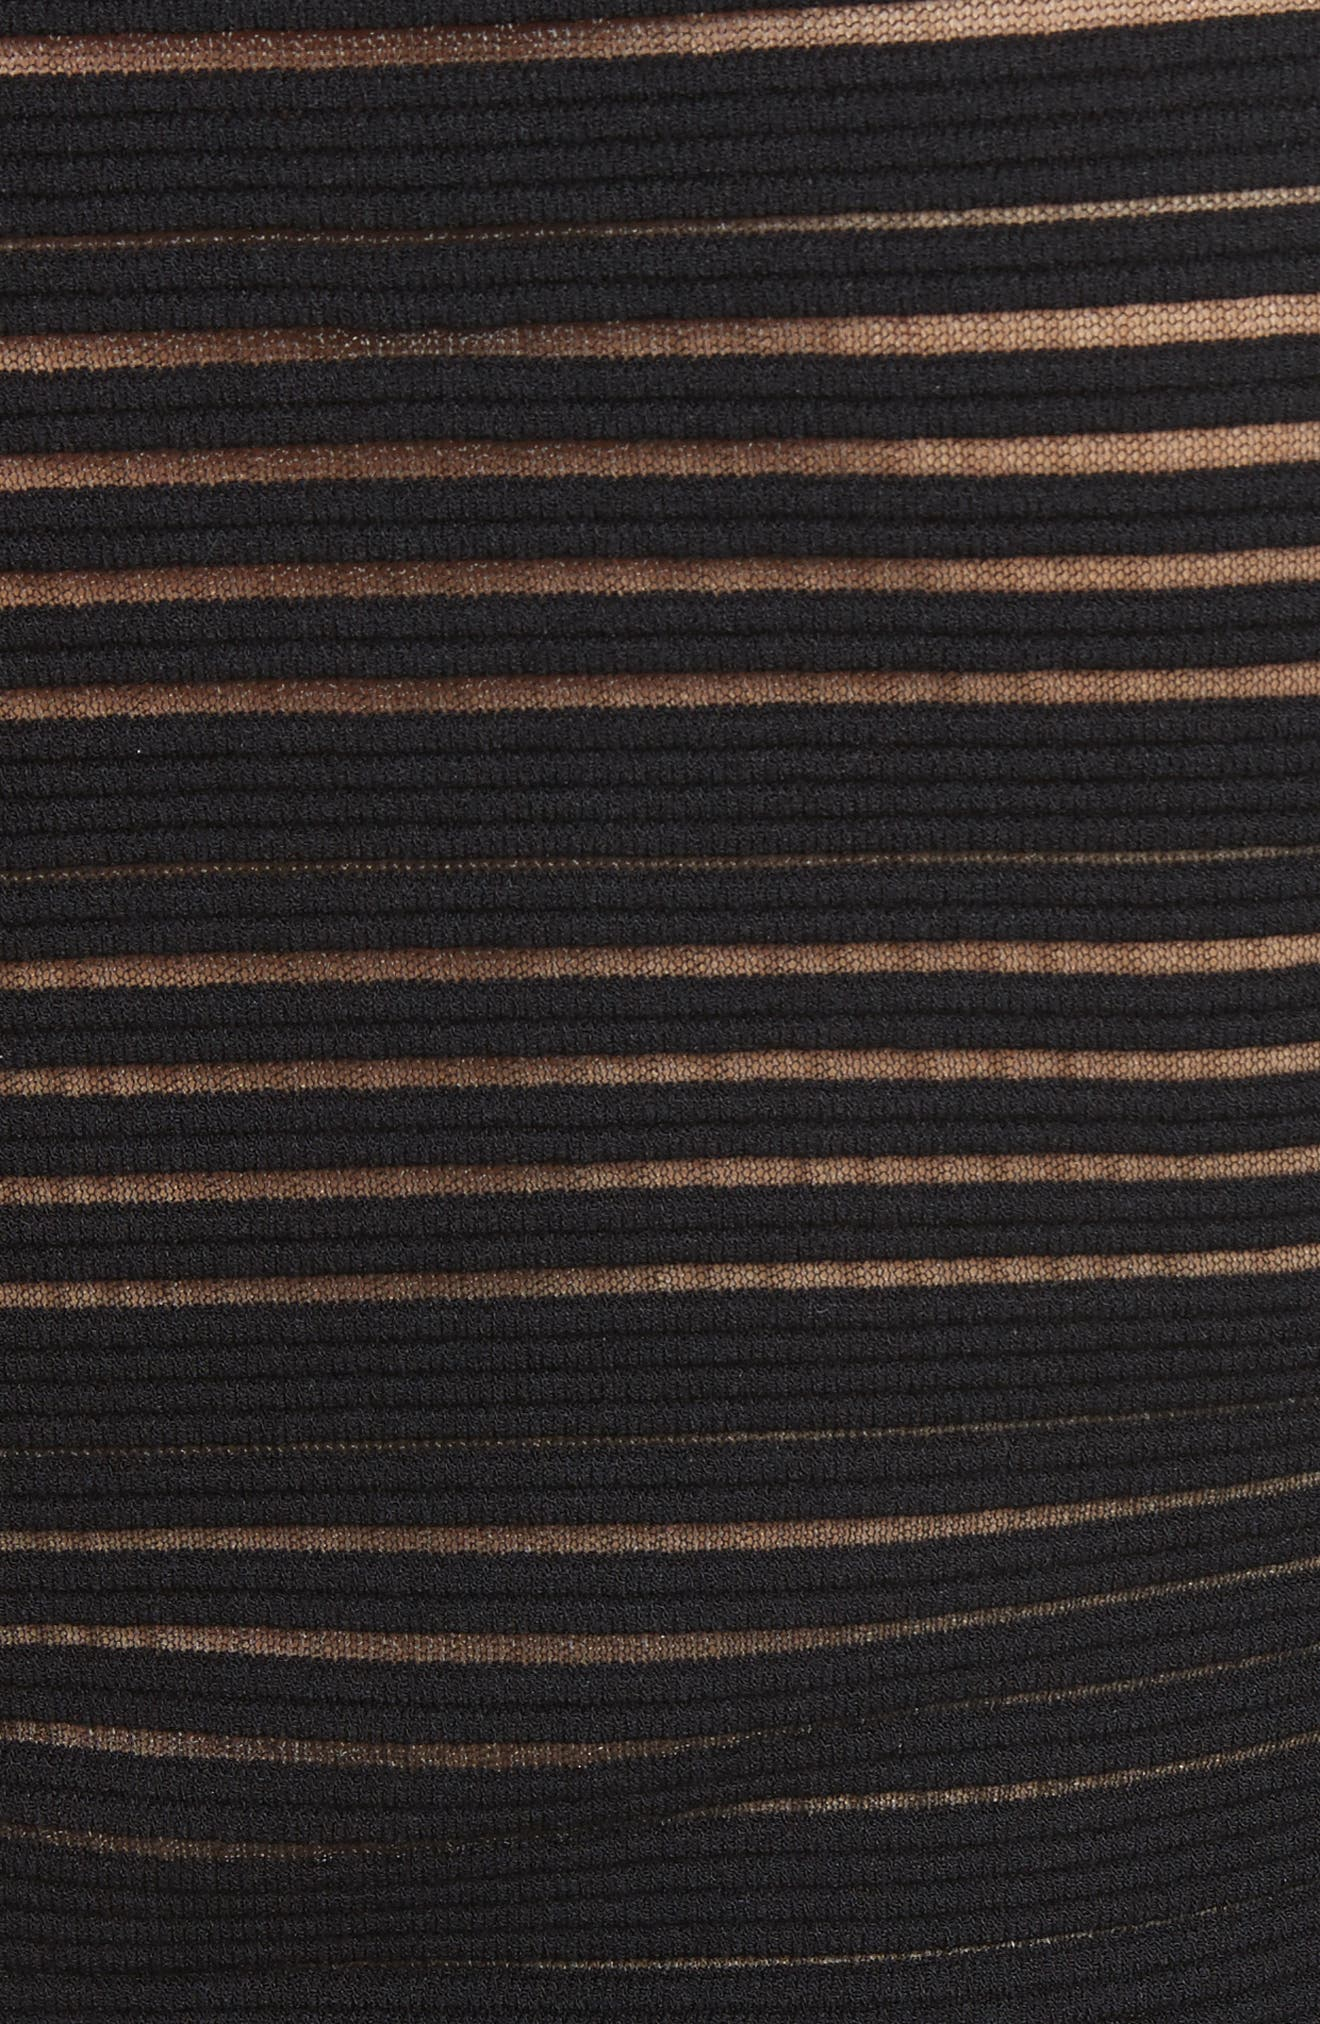 Stripe Knit A-Line Dress,                             Alternate thumbnail 5, color,                             Black